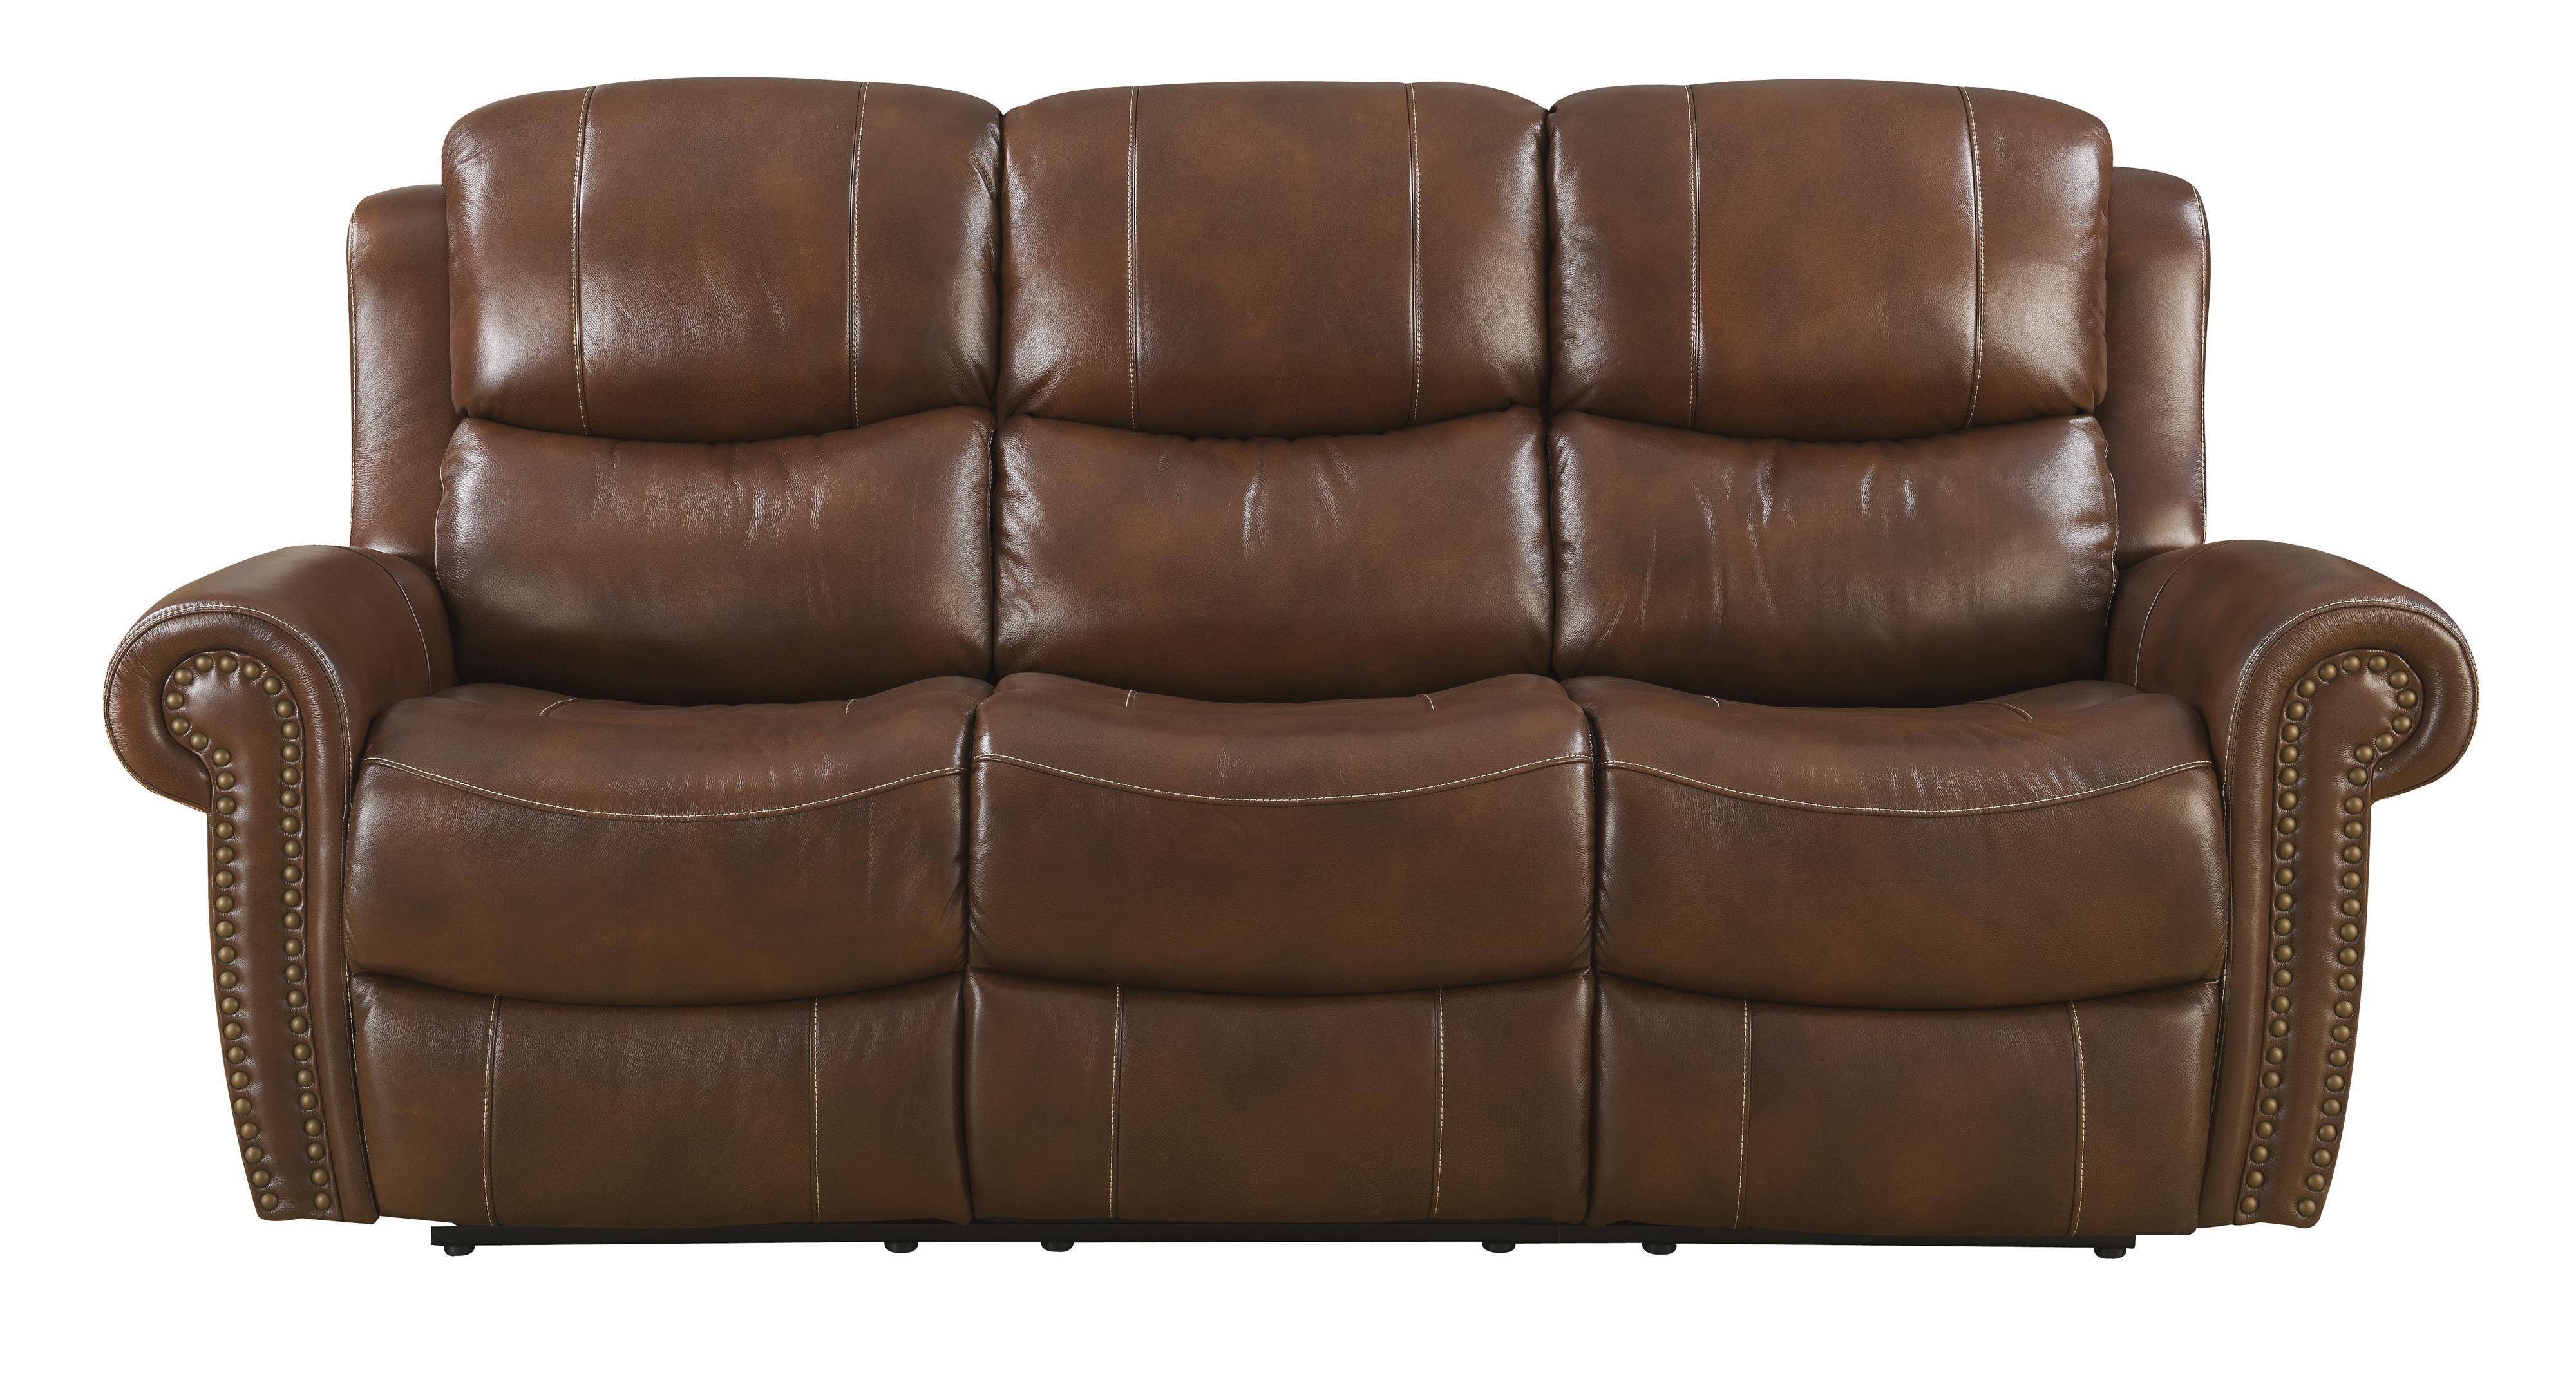 Belfort Basics Alomar Reclining Sofa - Item Number: ALOMAR-US RS-KilkChoc